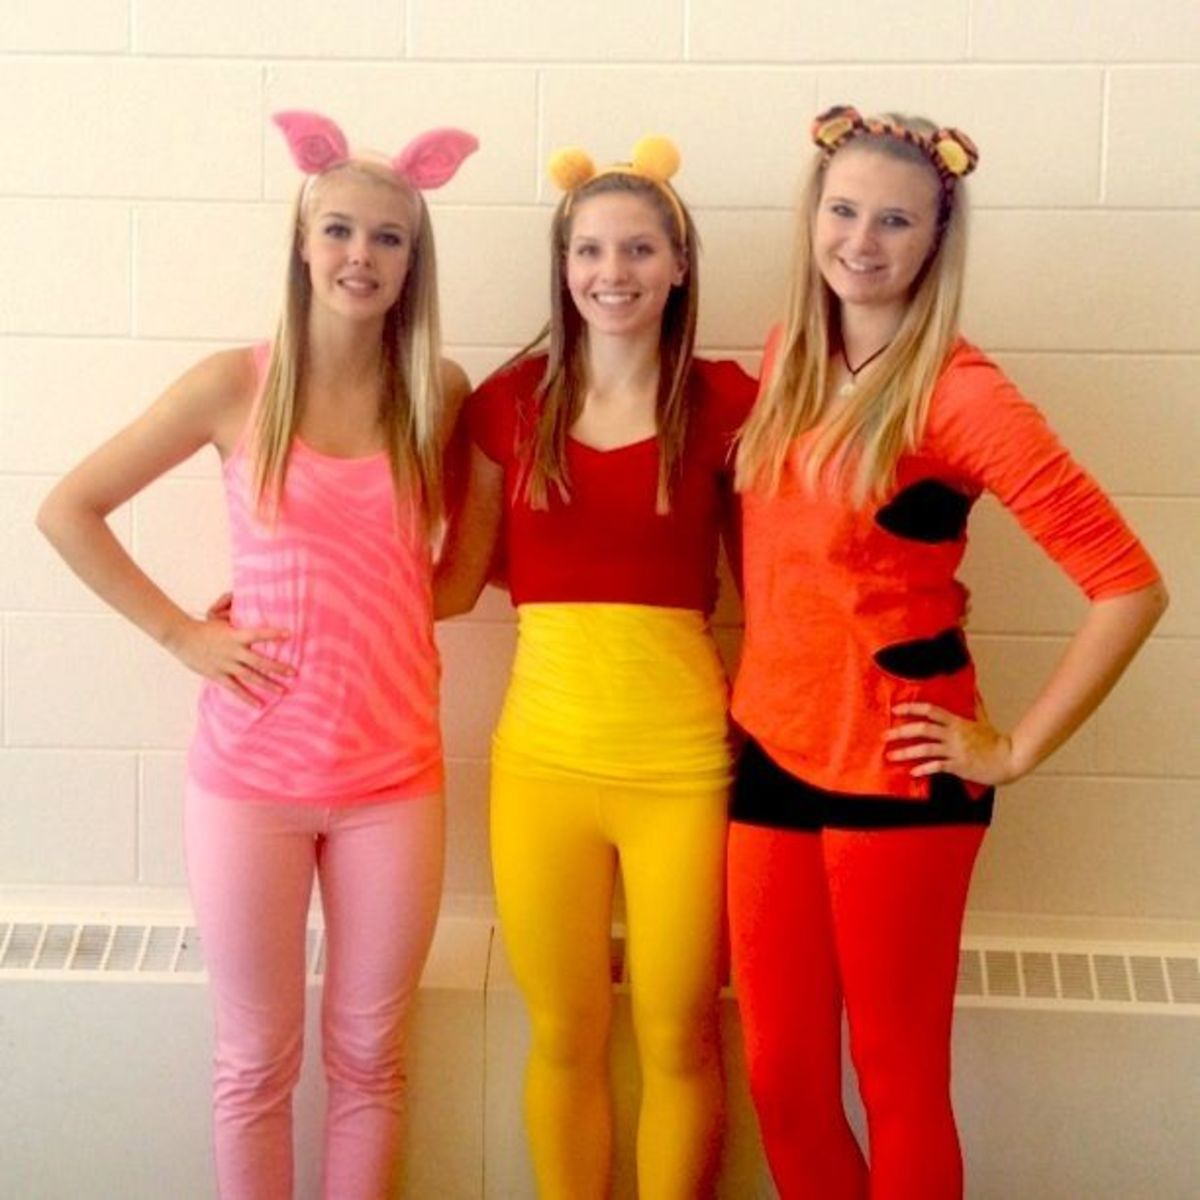 Winnie the Pooh Babes | DIY Halloween Costume Ideas